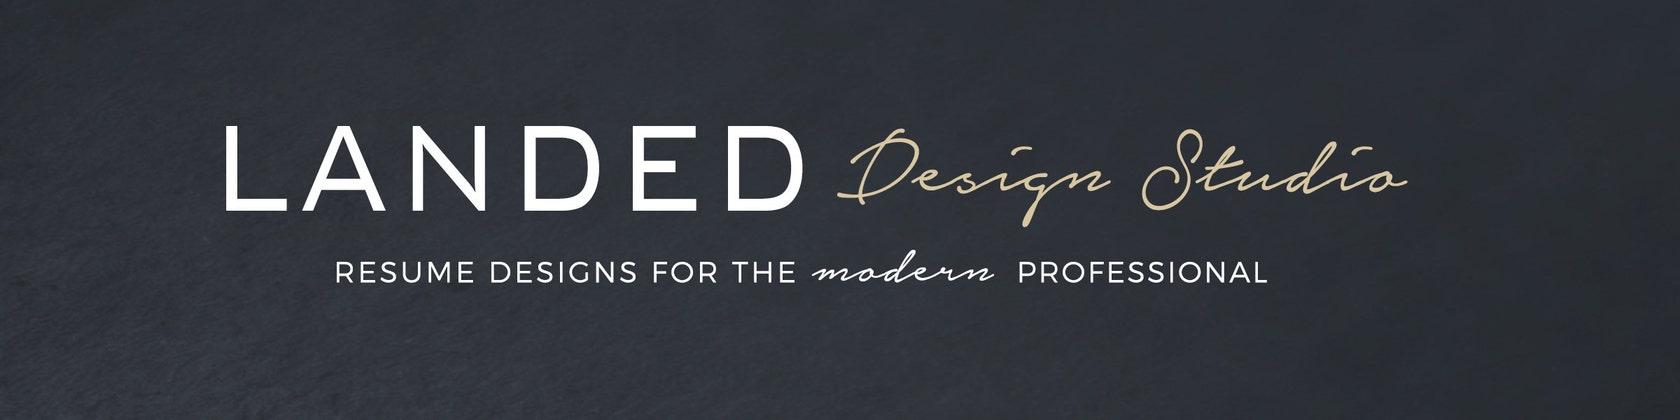 LandedDesignStudio Professional Resume Professional Resume Templates